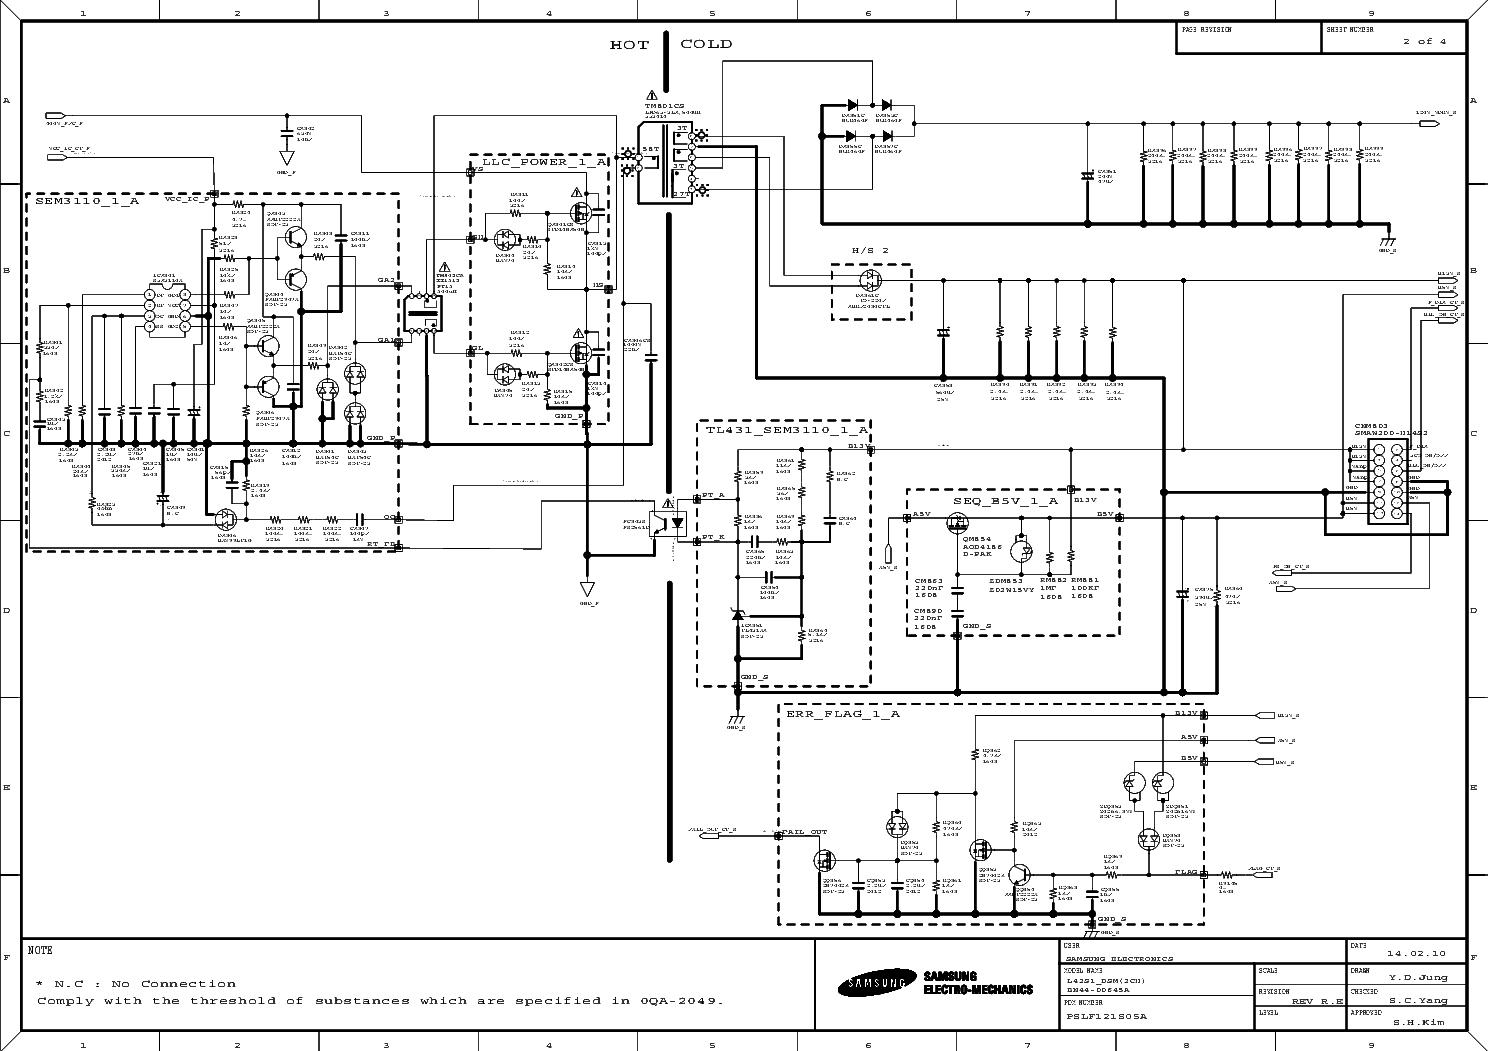 SAMSUNG BN44-00645A 40F5300 SMPS SCH Service Manual